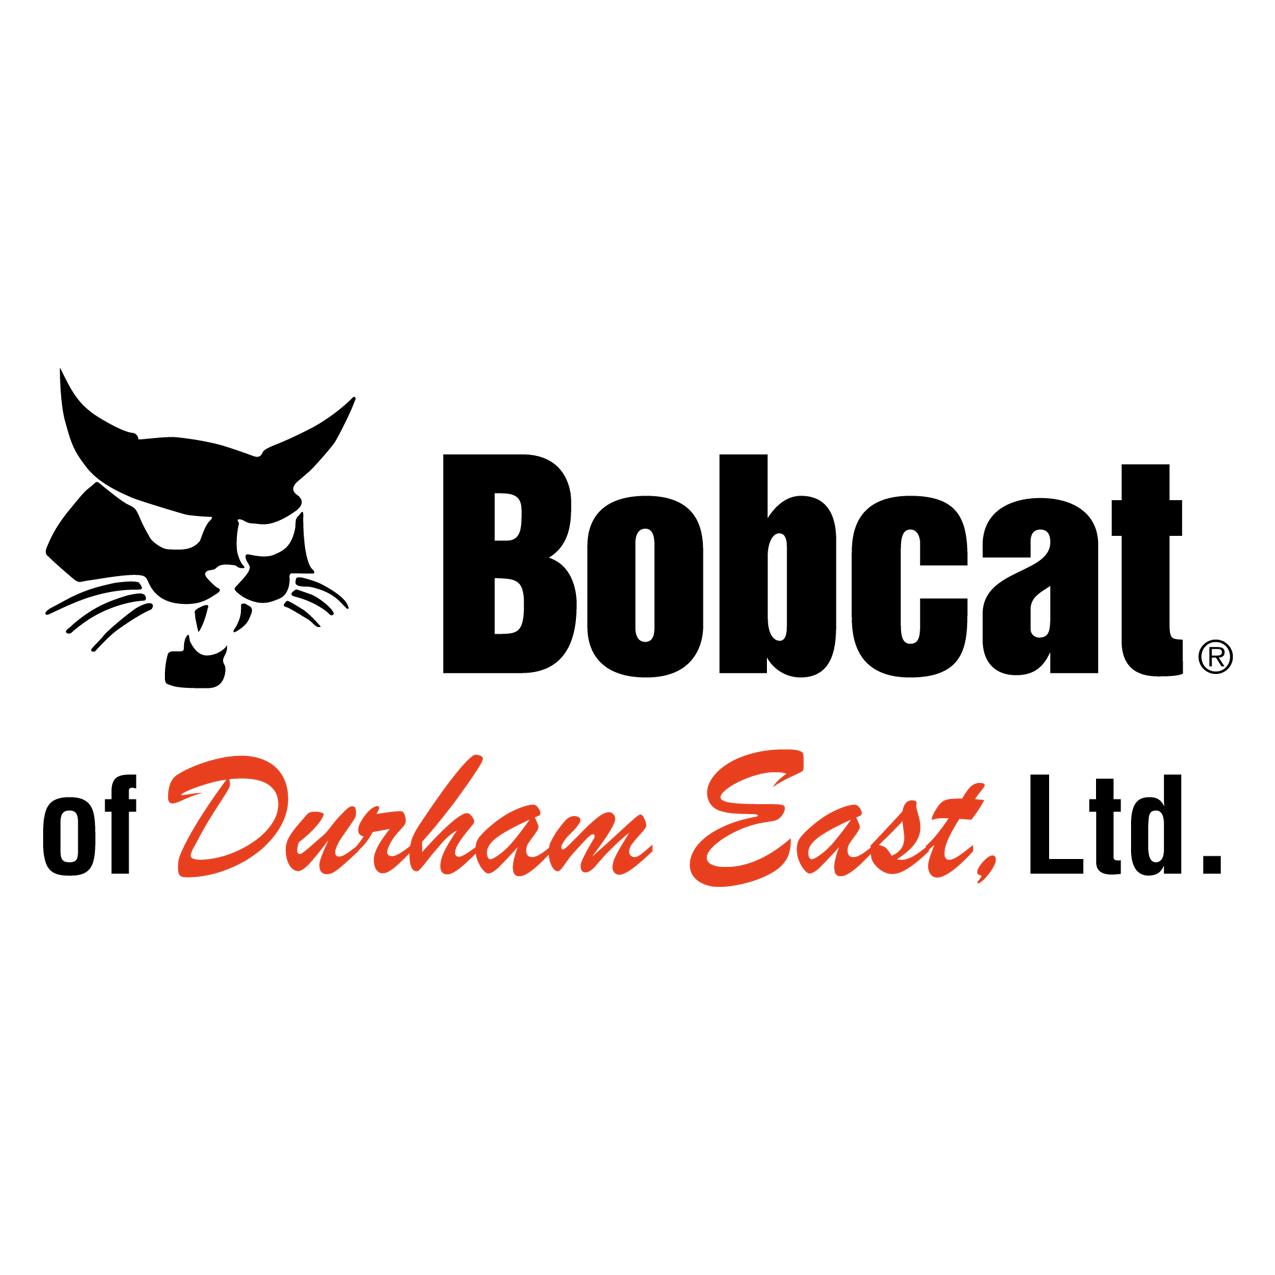 Bobcat of Durham East Ltd.